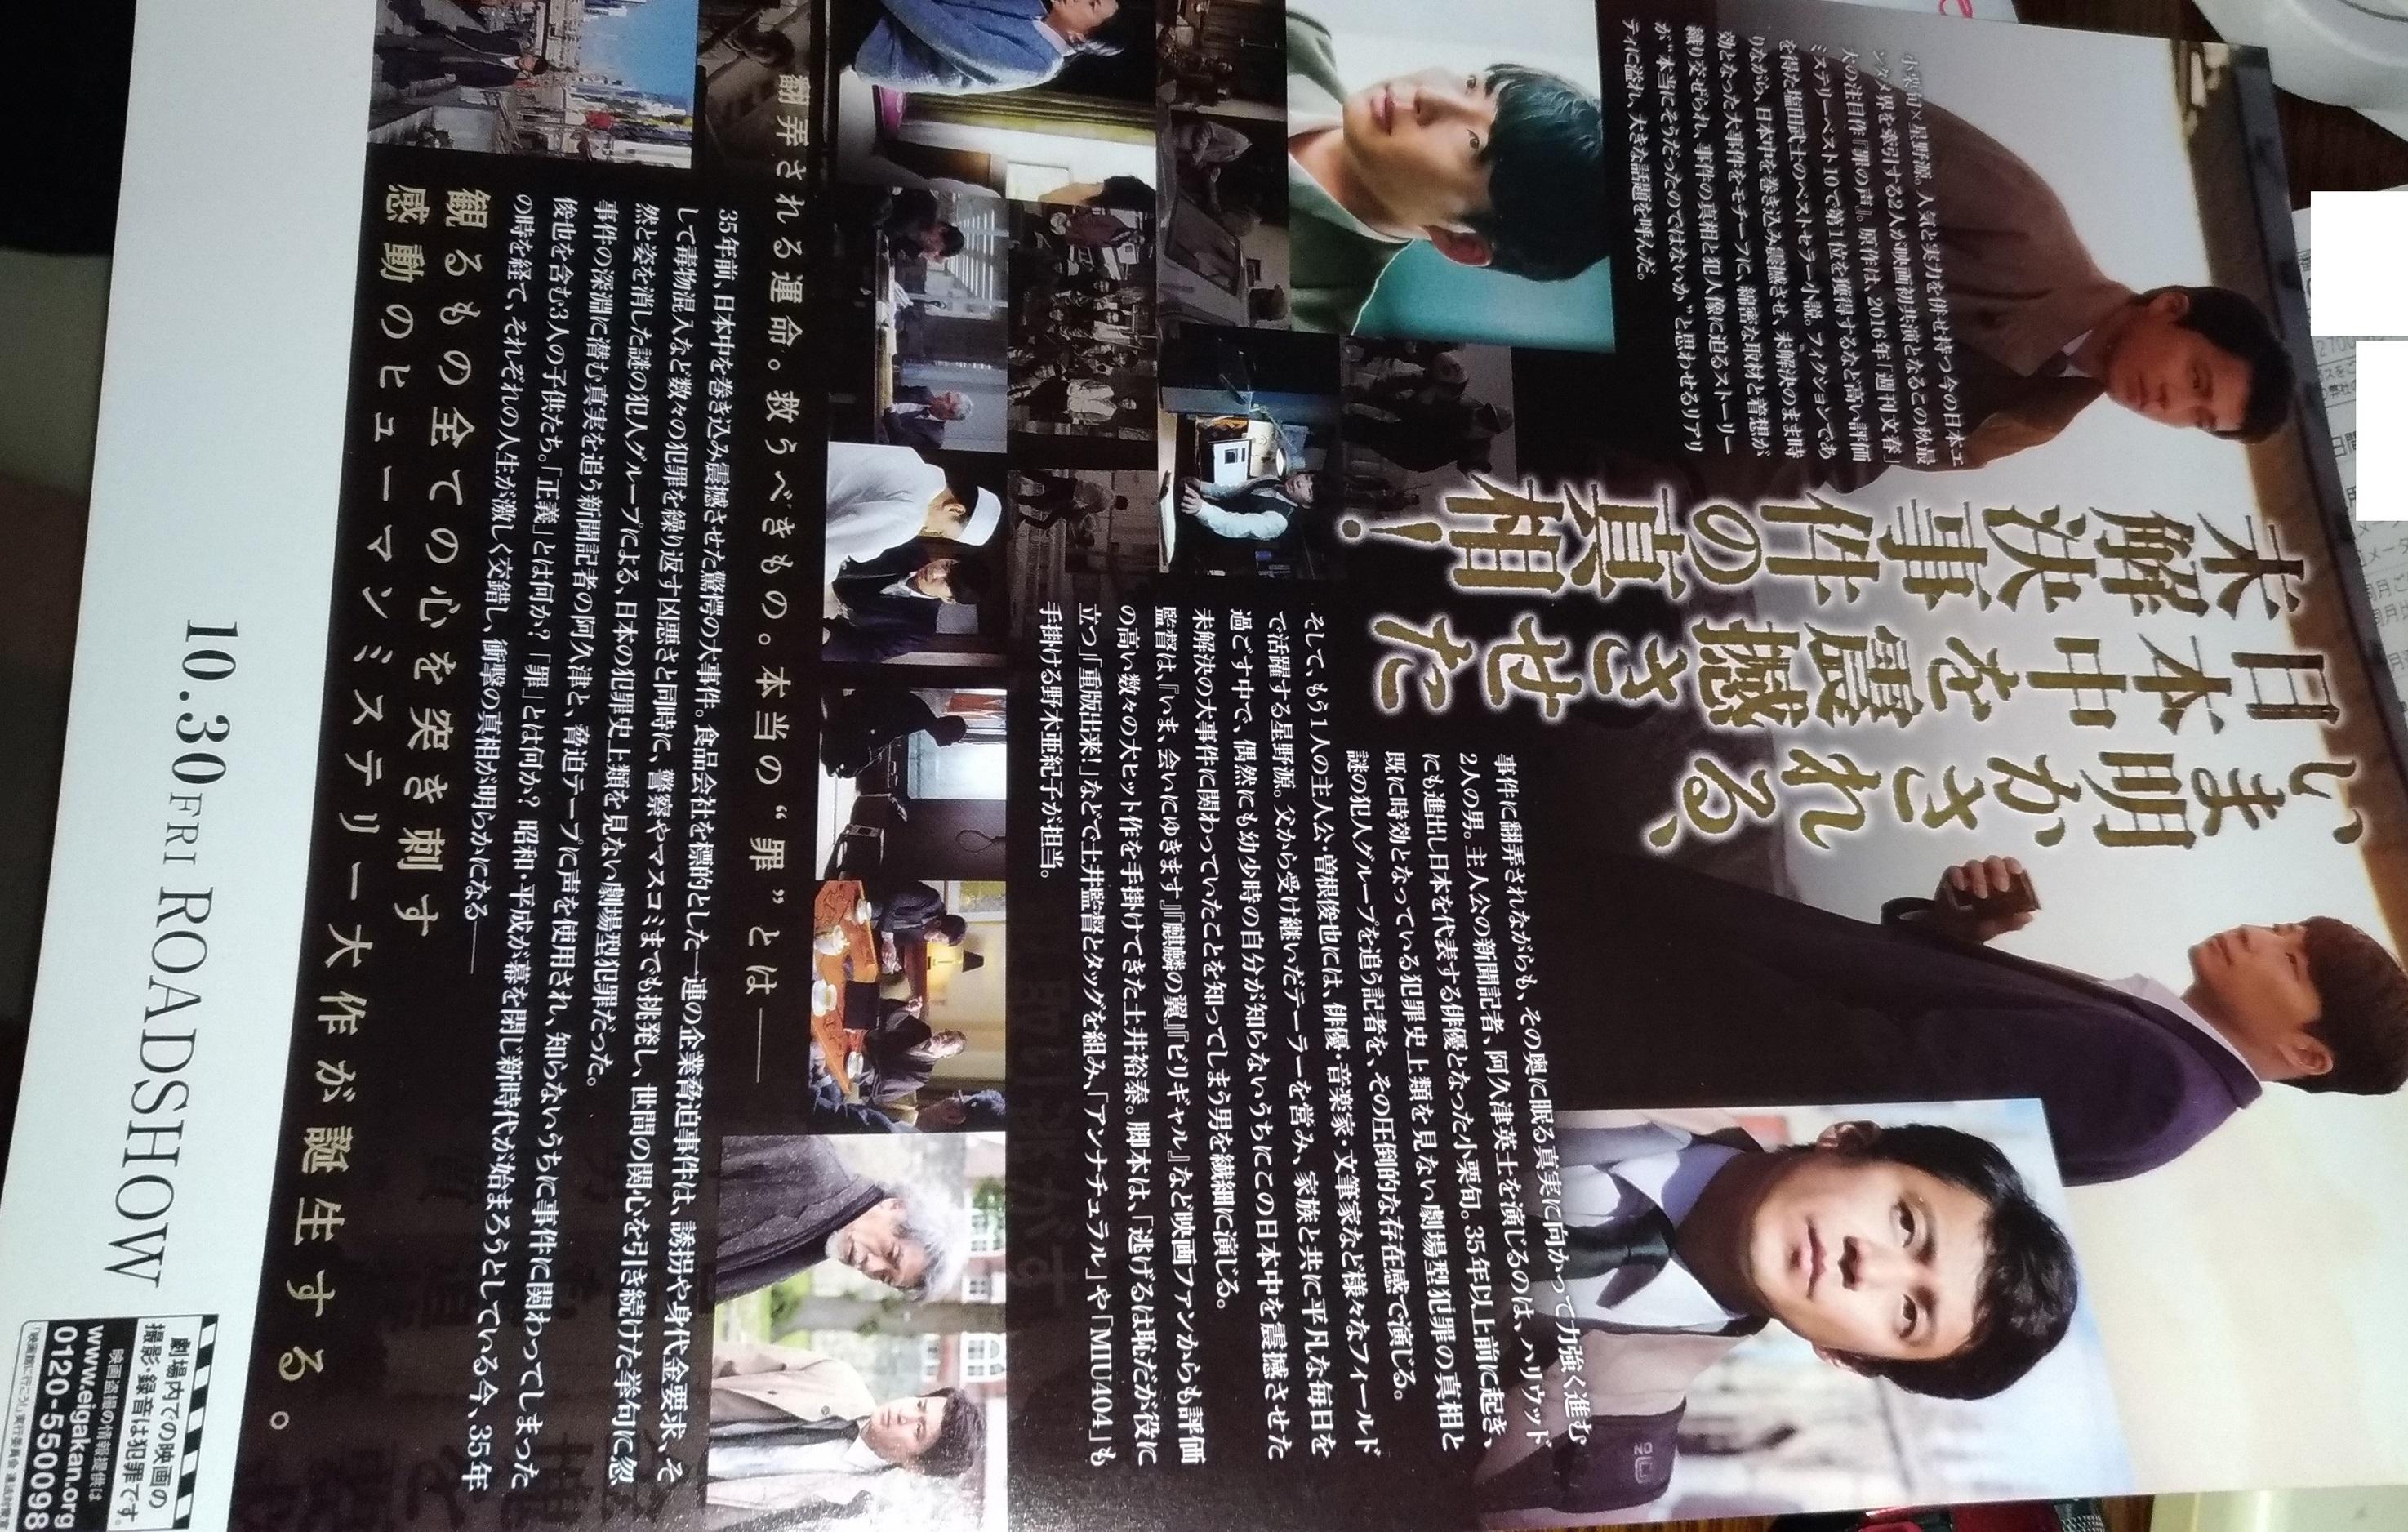 movies_eiga_1700_osaka_1030_3.jpg